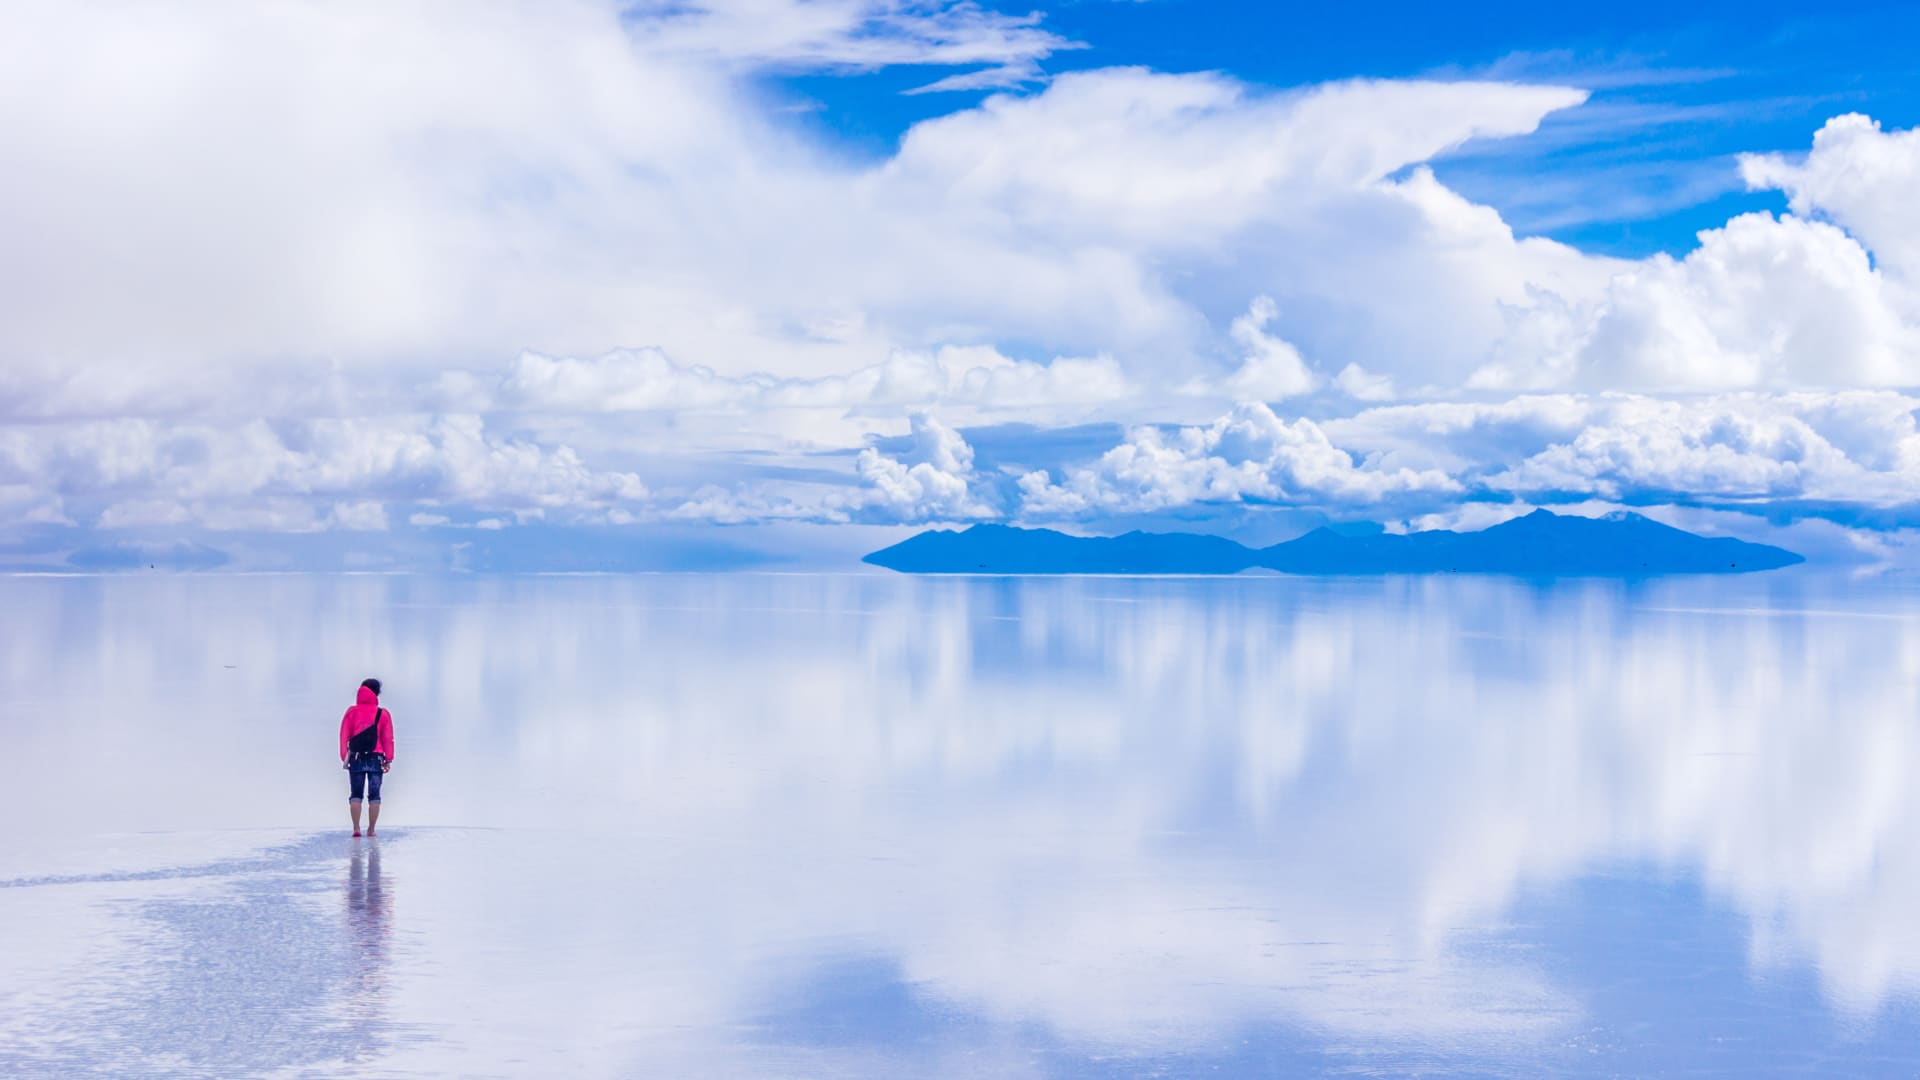 Rain causes Bolivia's Uyuni salt flats to take on a still mirror-like quality.